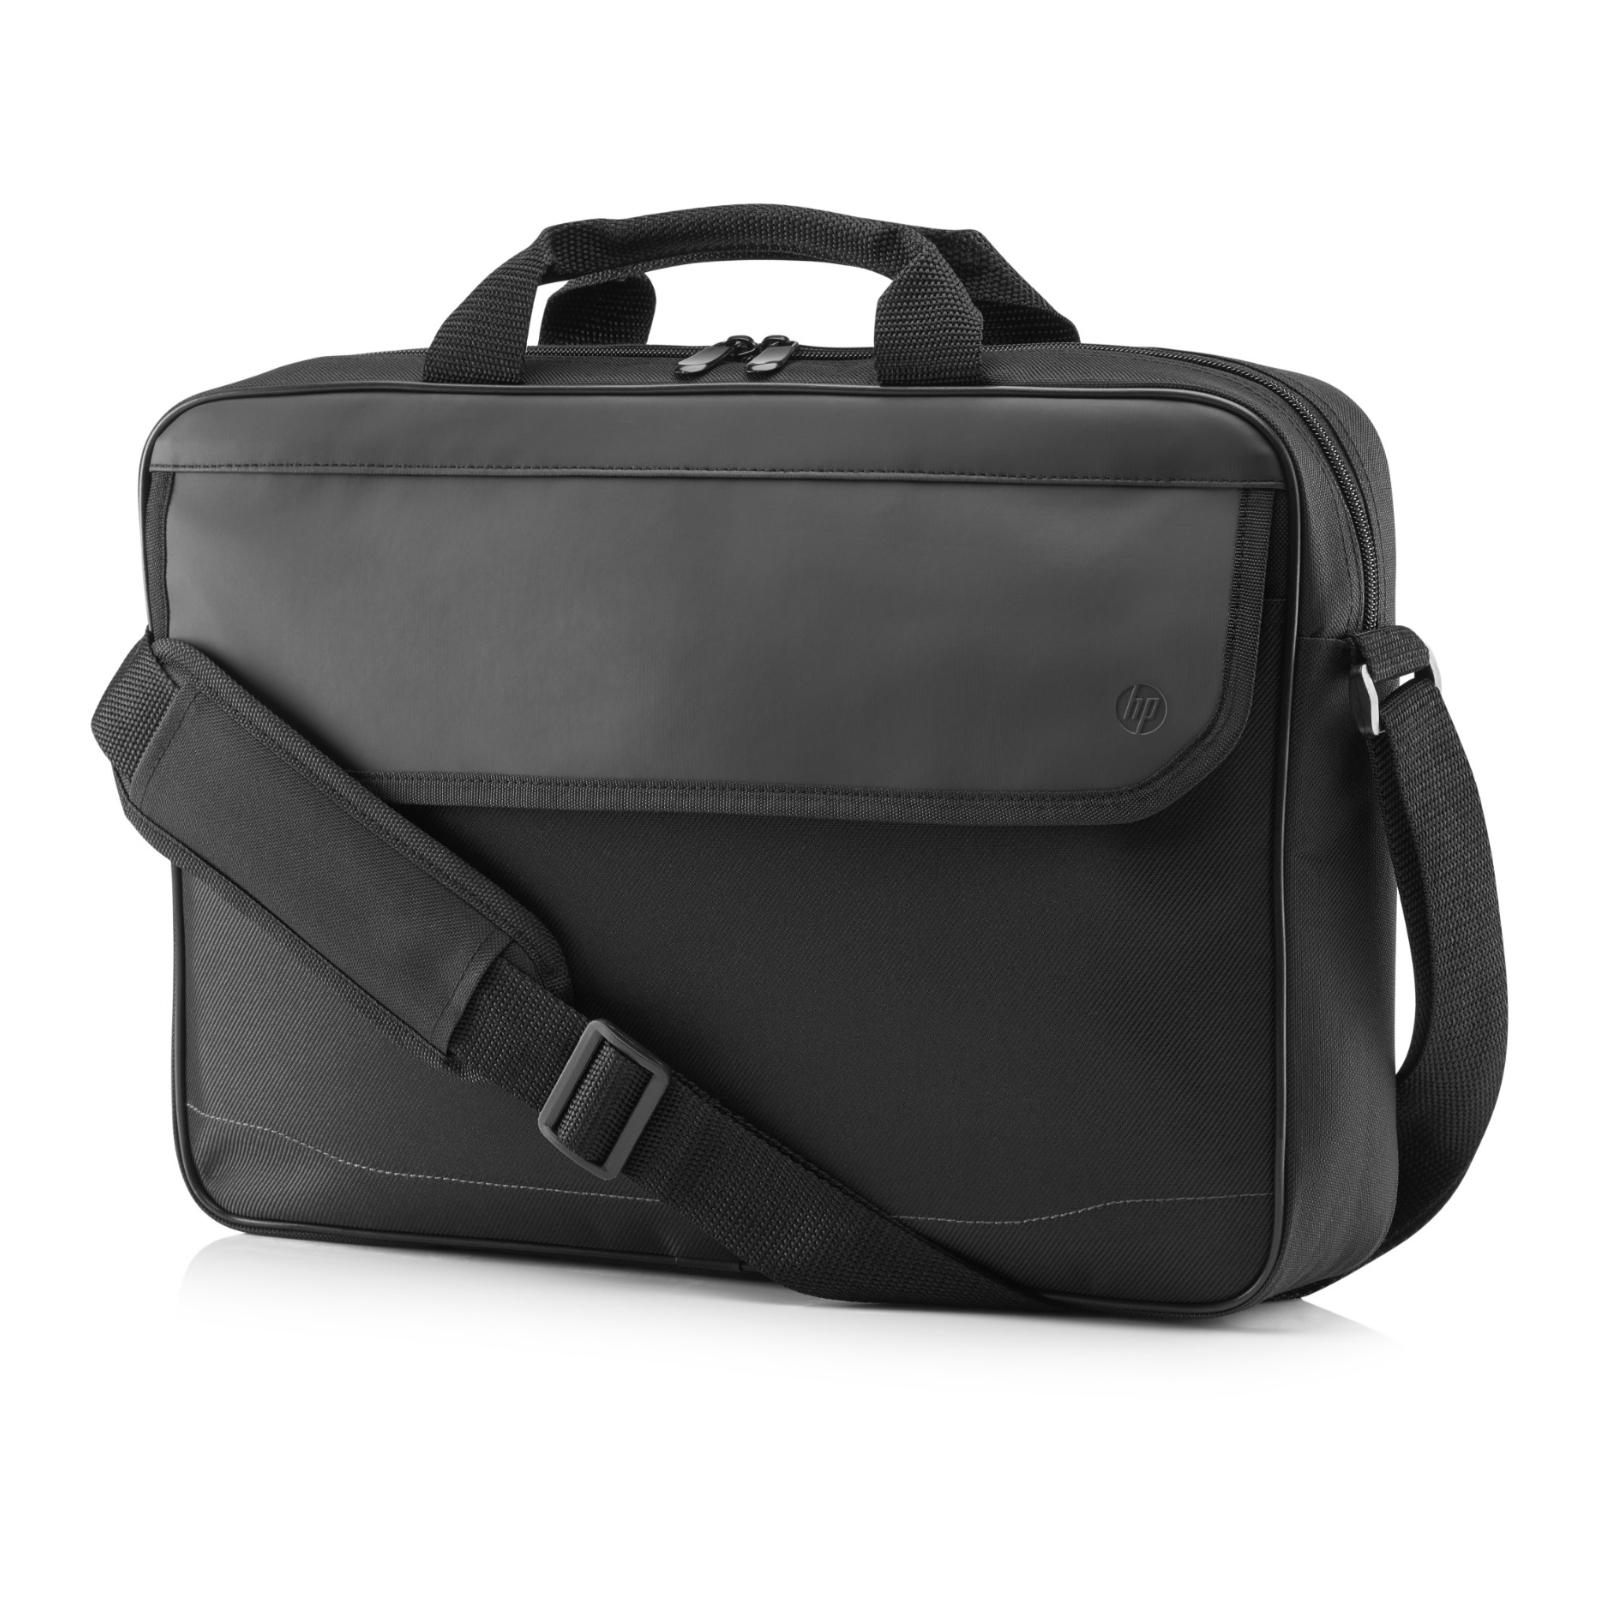 HPTOPLOADER NOTEBOOK BAG PRELUDE BLACK 15.6 INCH 1 YEAR CARRY IN WARRANTY